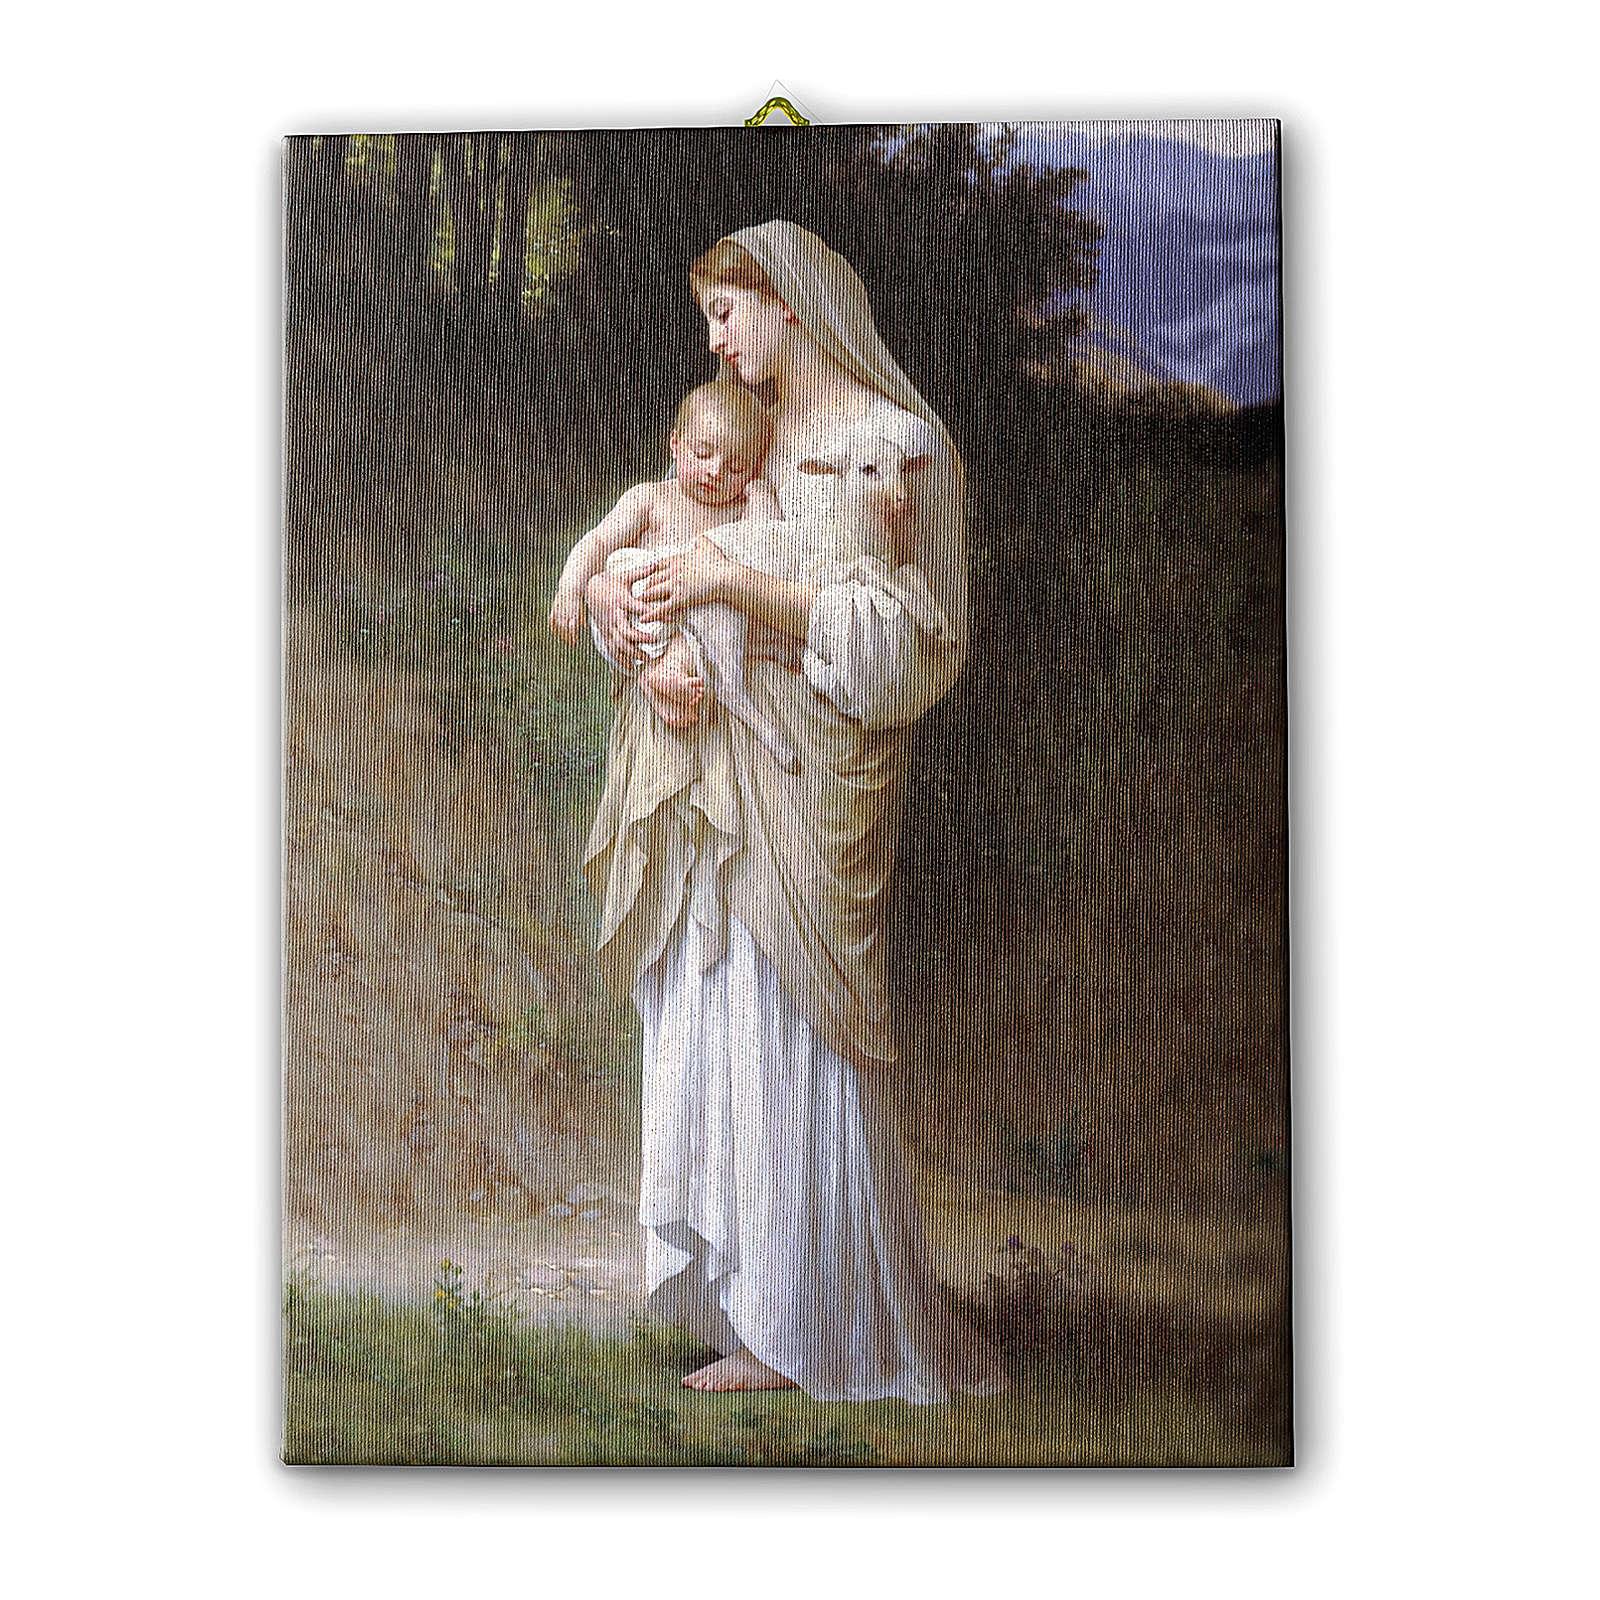 Quadro su tela pittorica Divina Innocenza di Bouguereau 25x20 cm 3